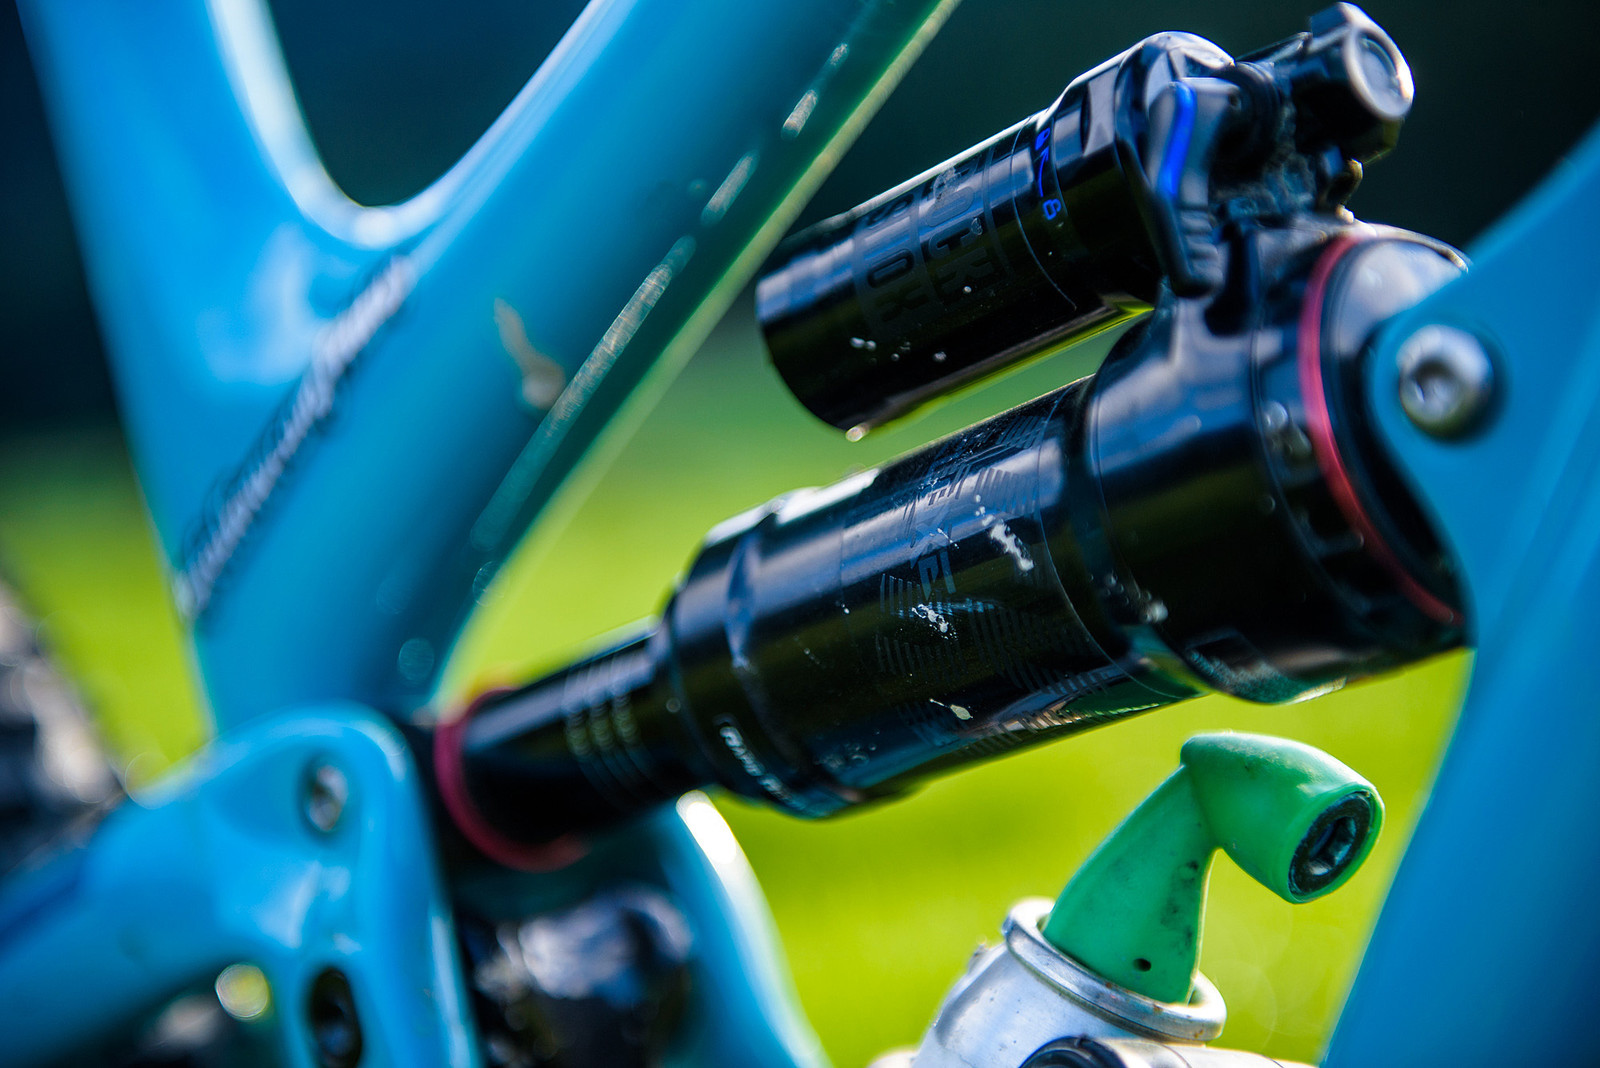 Custom RockShox SuperDeluxe - Nate Hills' Yeti SB5 with 2019 RockShox Lyrik - Mountain Biking Pictures - Vital MTB